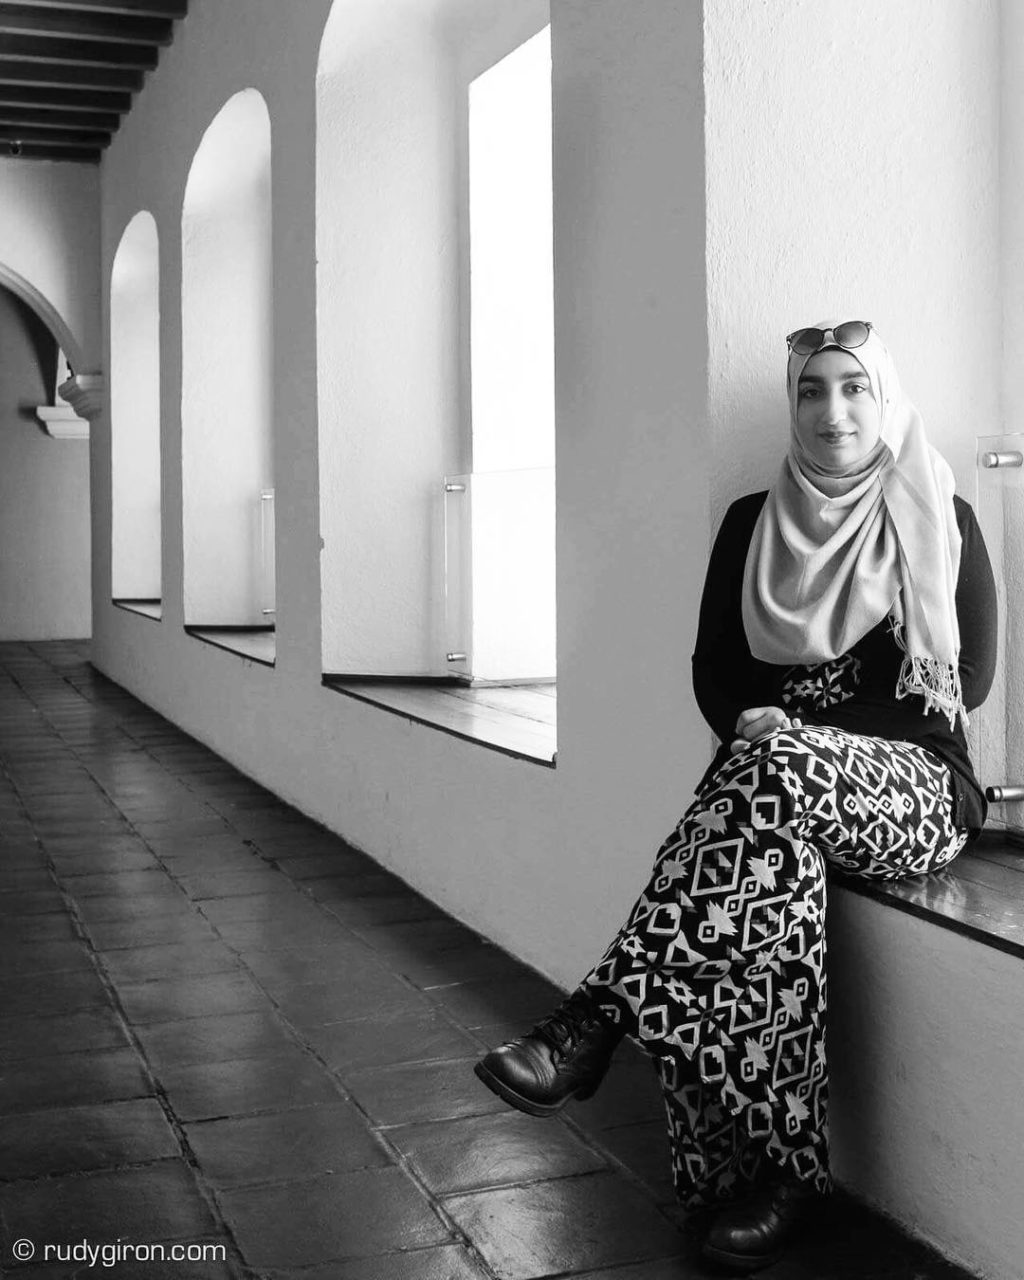 Portraits of Strangers — Meet Saba, a New Yorker